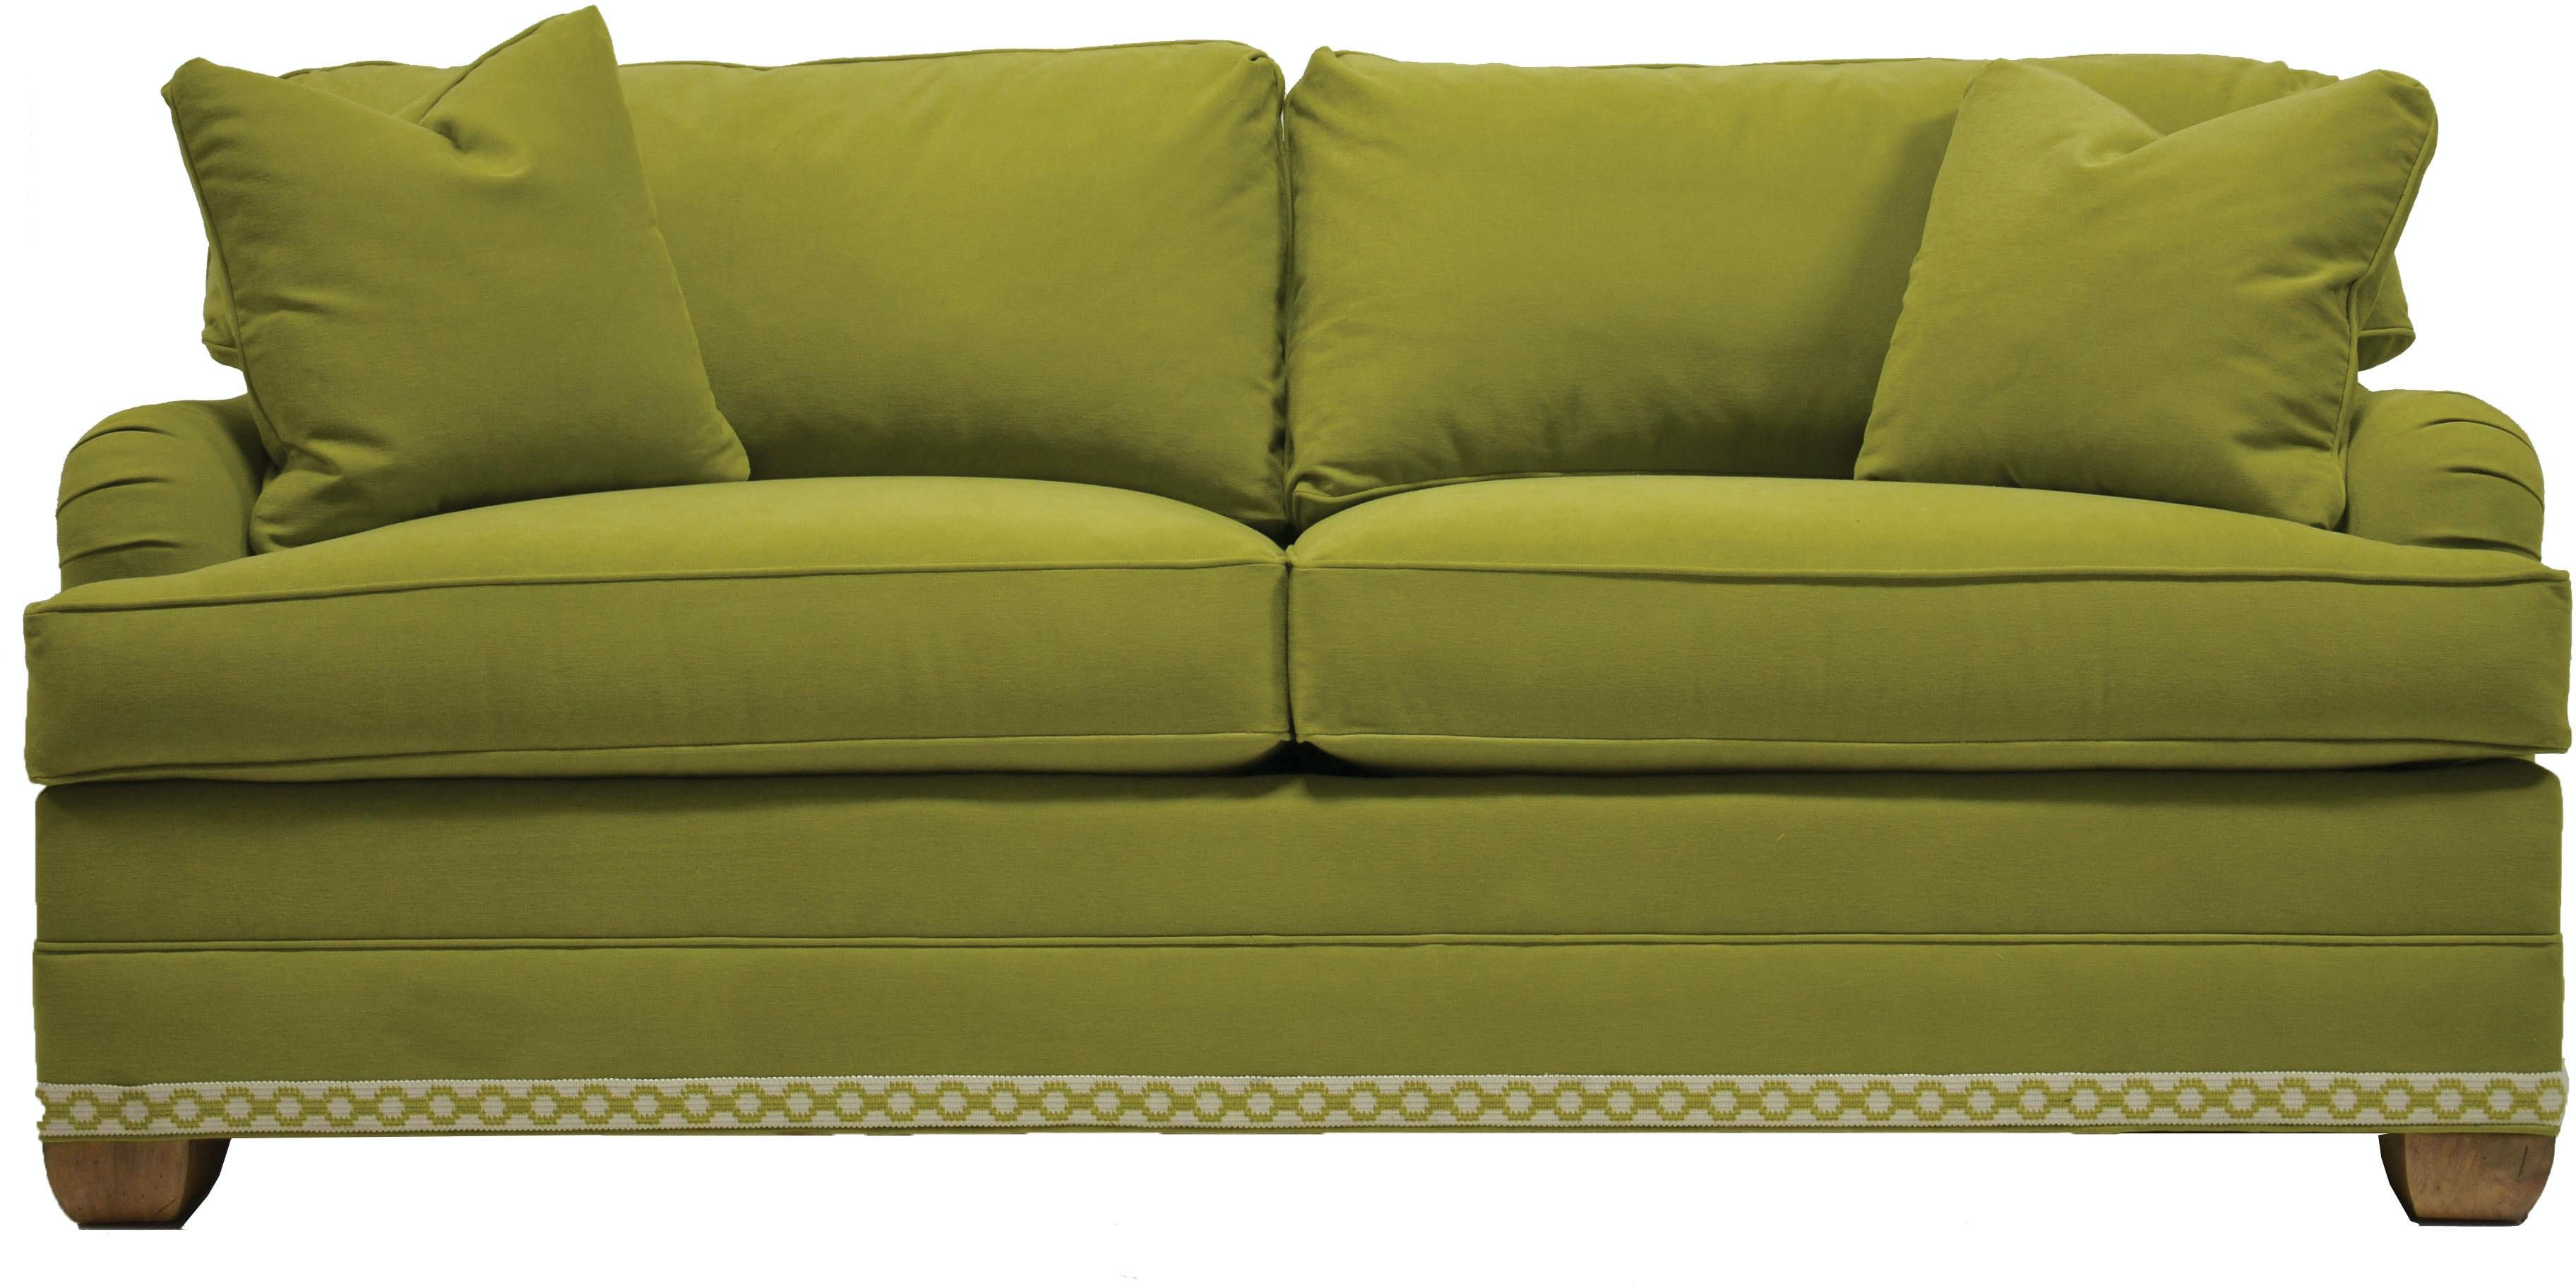 Vanguard Furniture 603 2SS Living Room East Lake Sleep Sofa